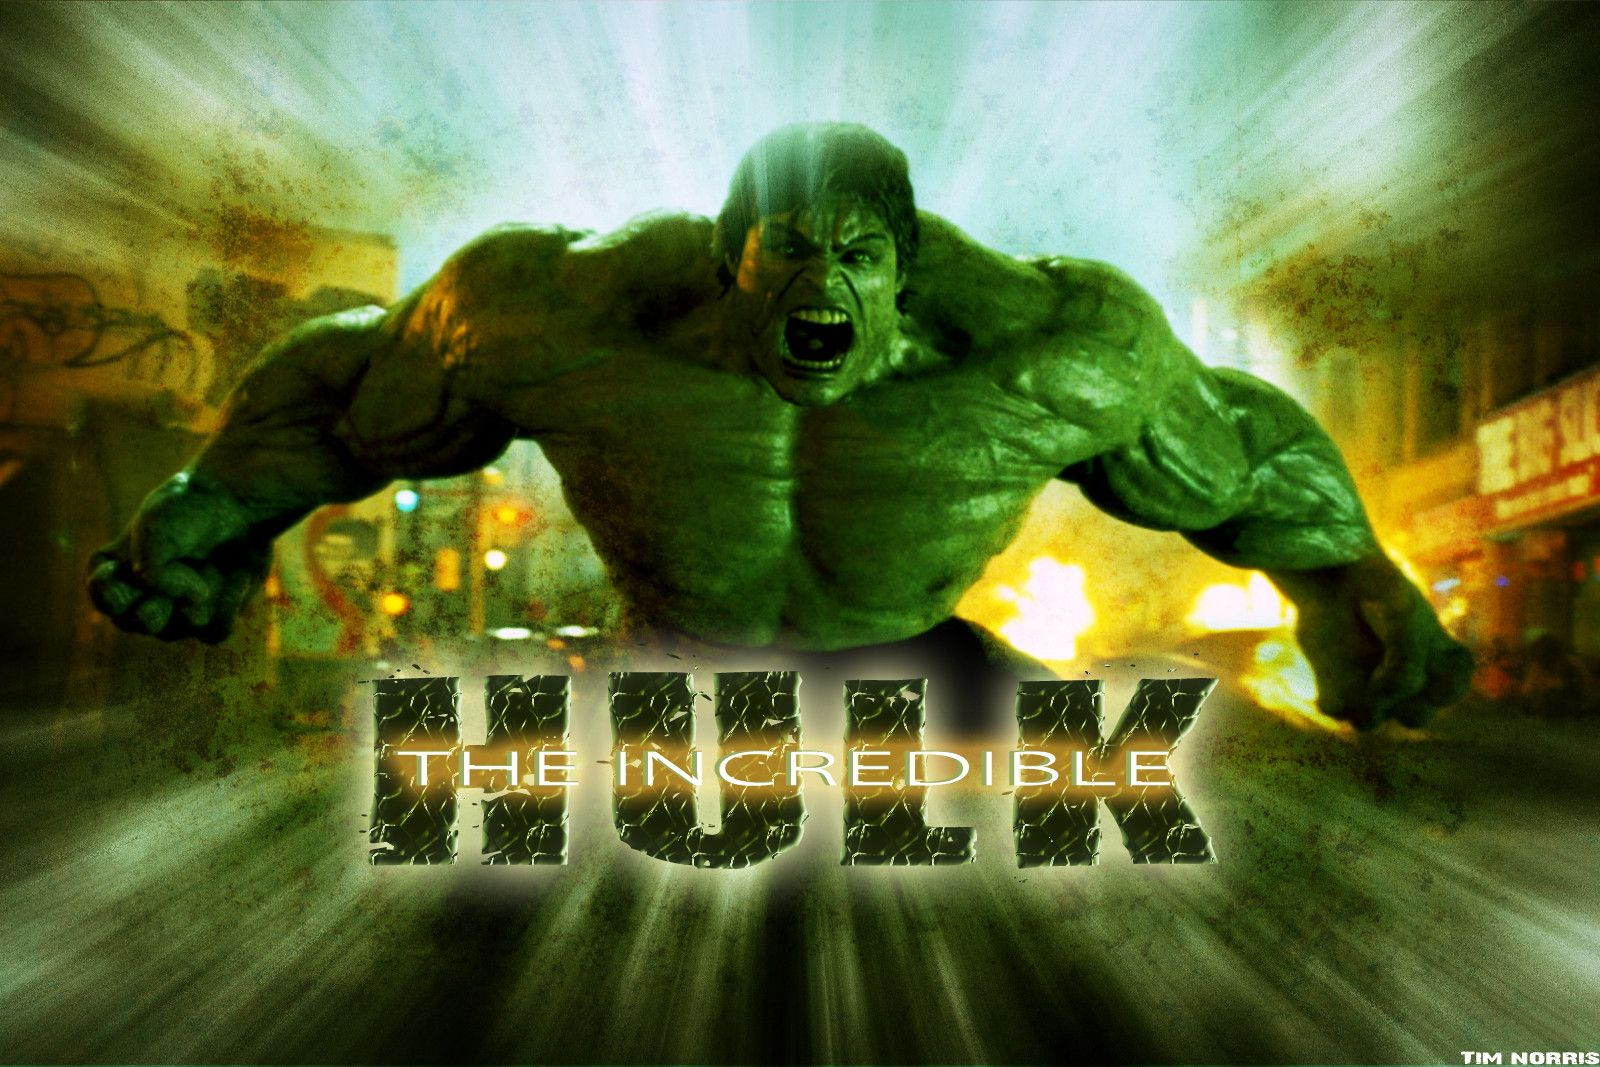 Incredible Hulk Hd Wallpapers Free Download Latest Incredible Hulk